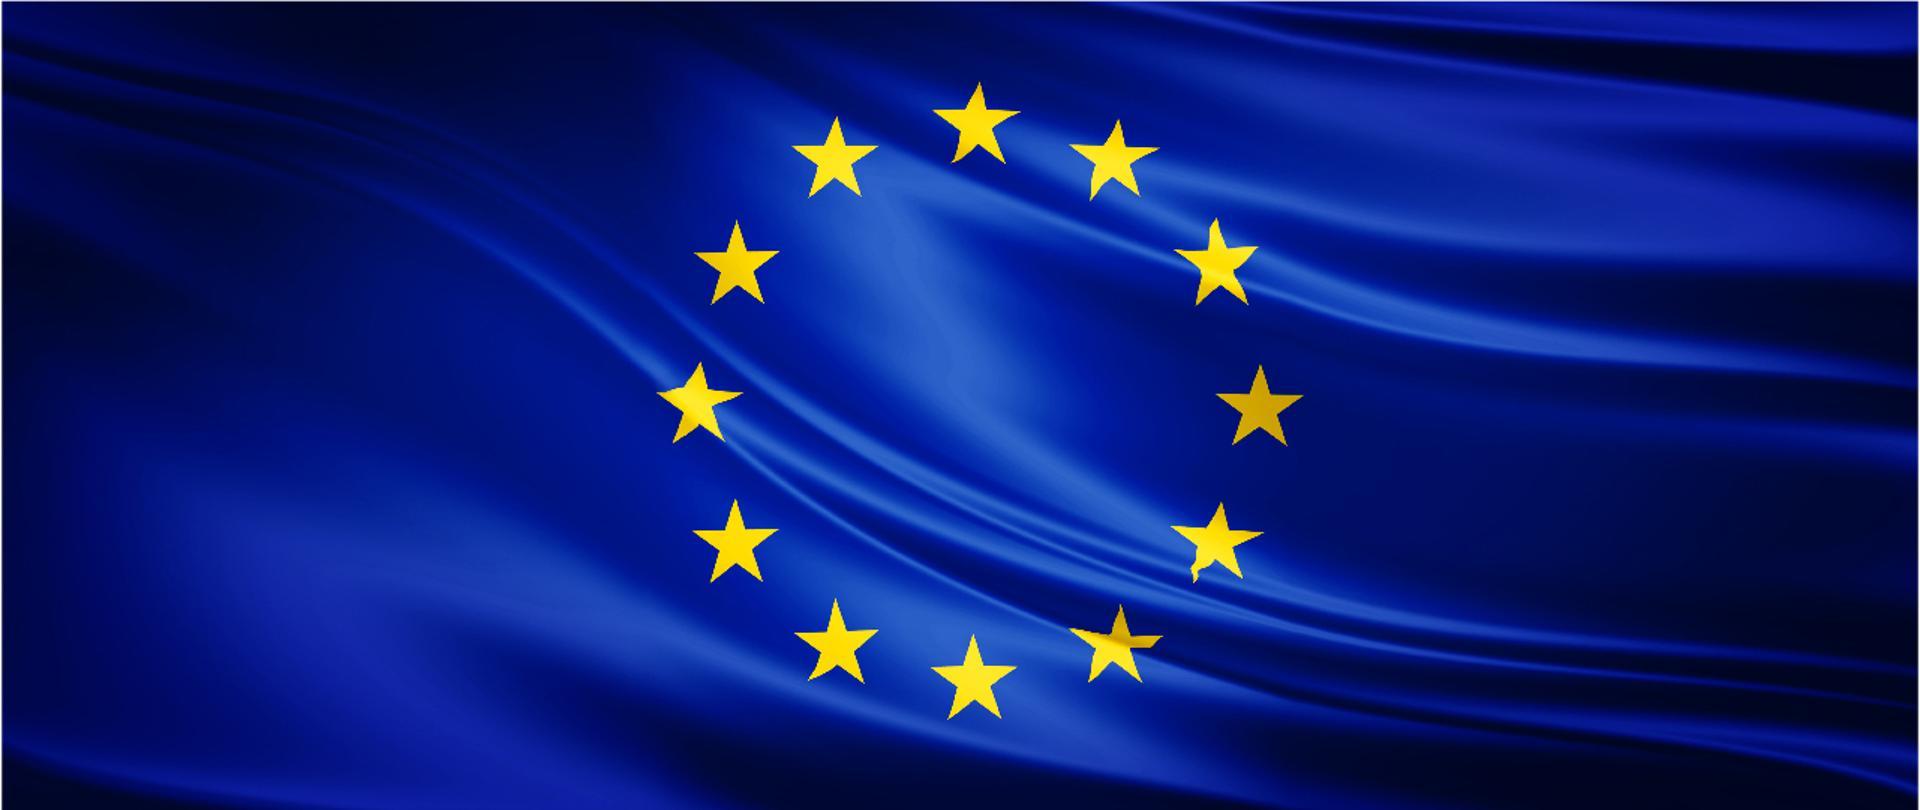 UE - Unia Europejska - Ministerstwo Obrony Narodowej - Portal Gov.pl